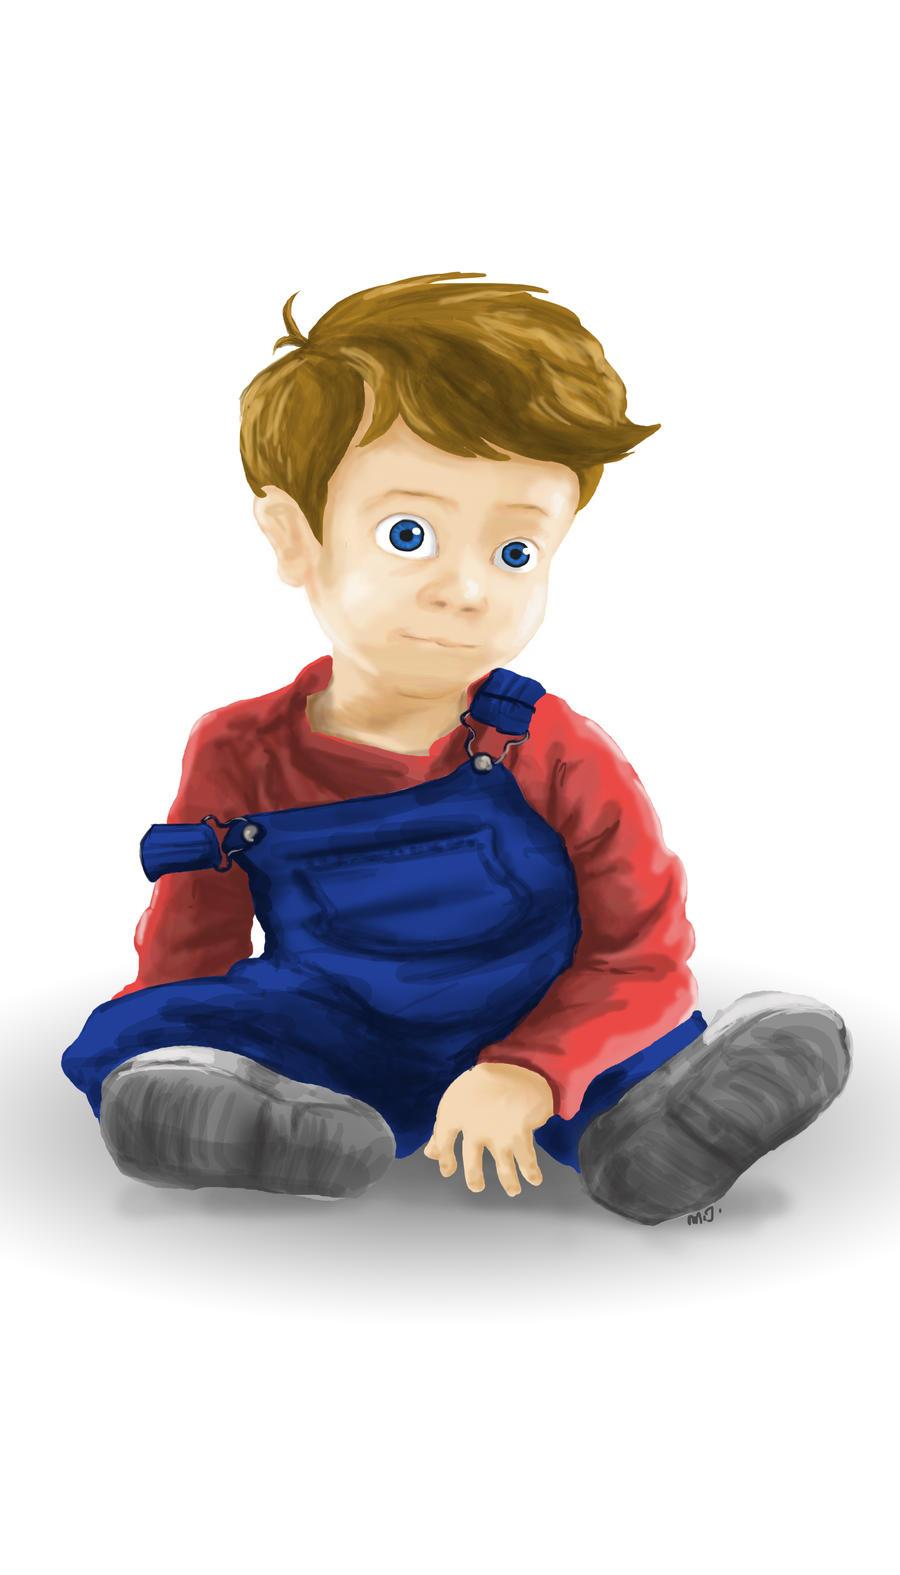 child cartoon by amazingmad child cartoon by amazingmad - Cartoon Picture Of Child